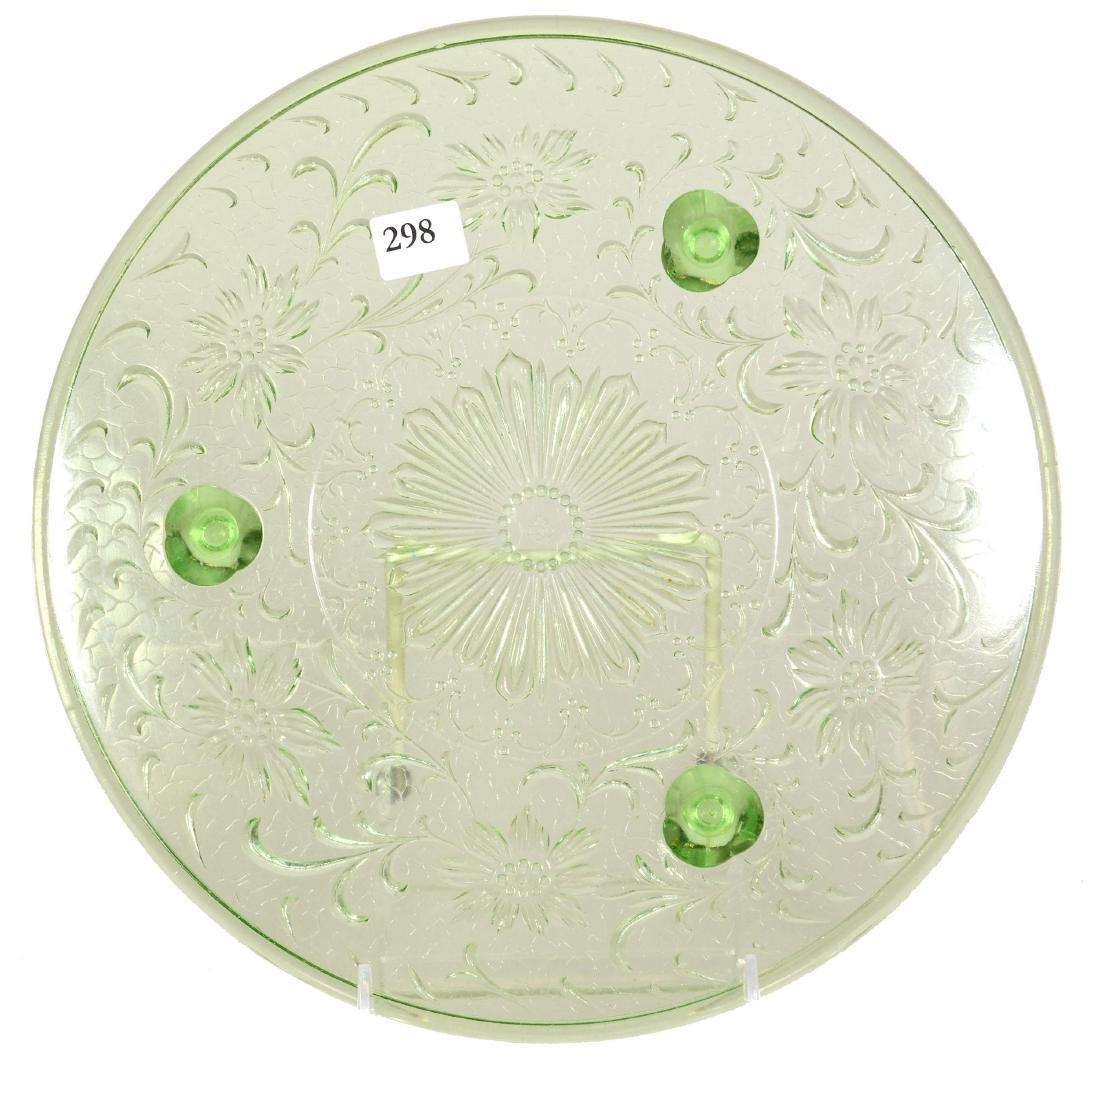 (5) Assorted Art Glass Items - 2